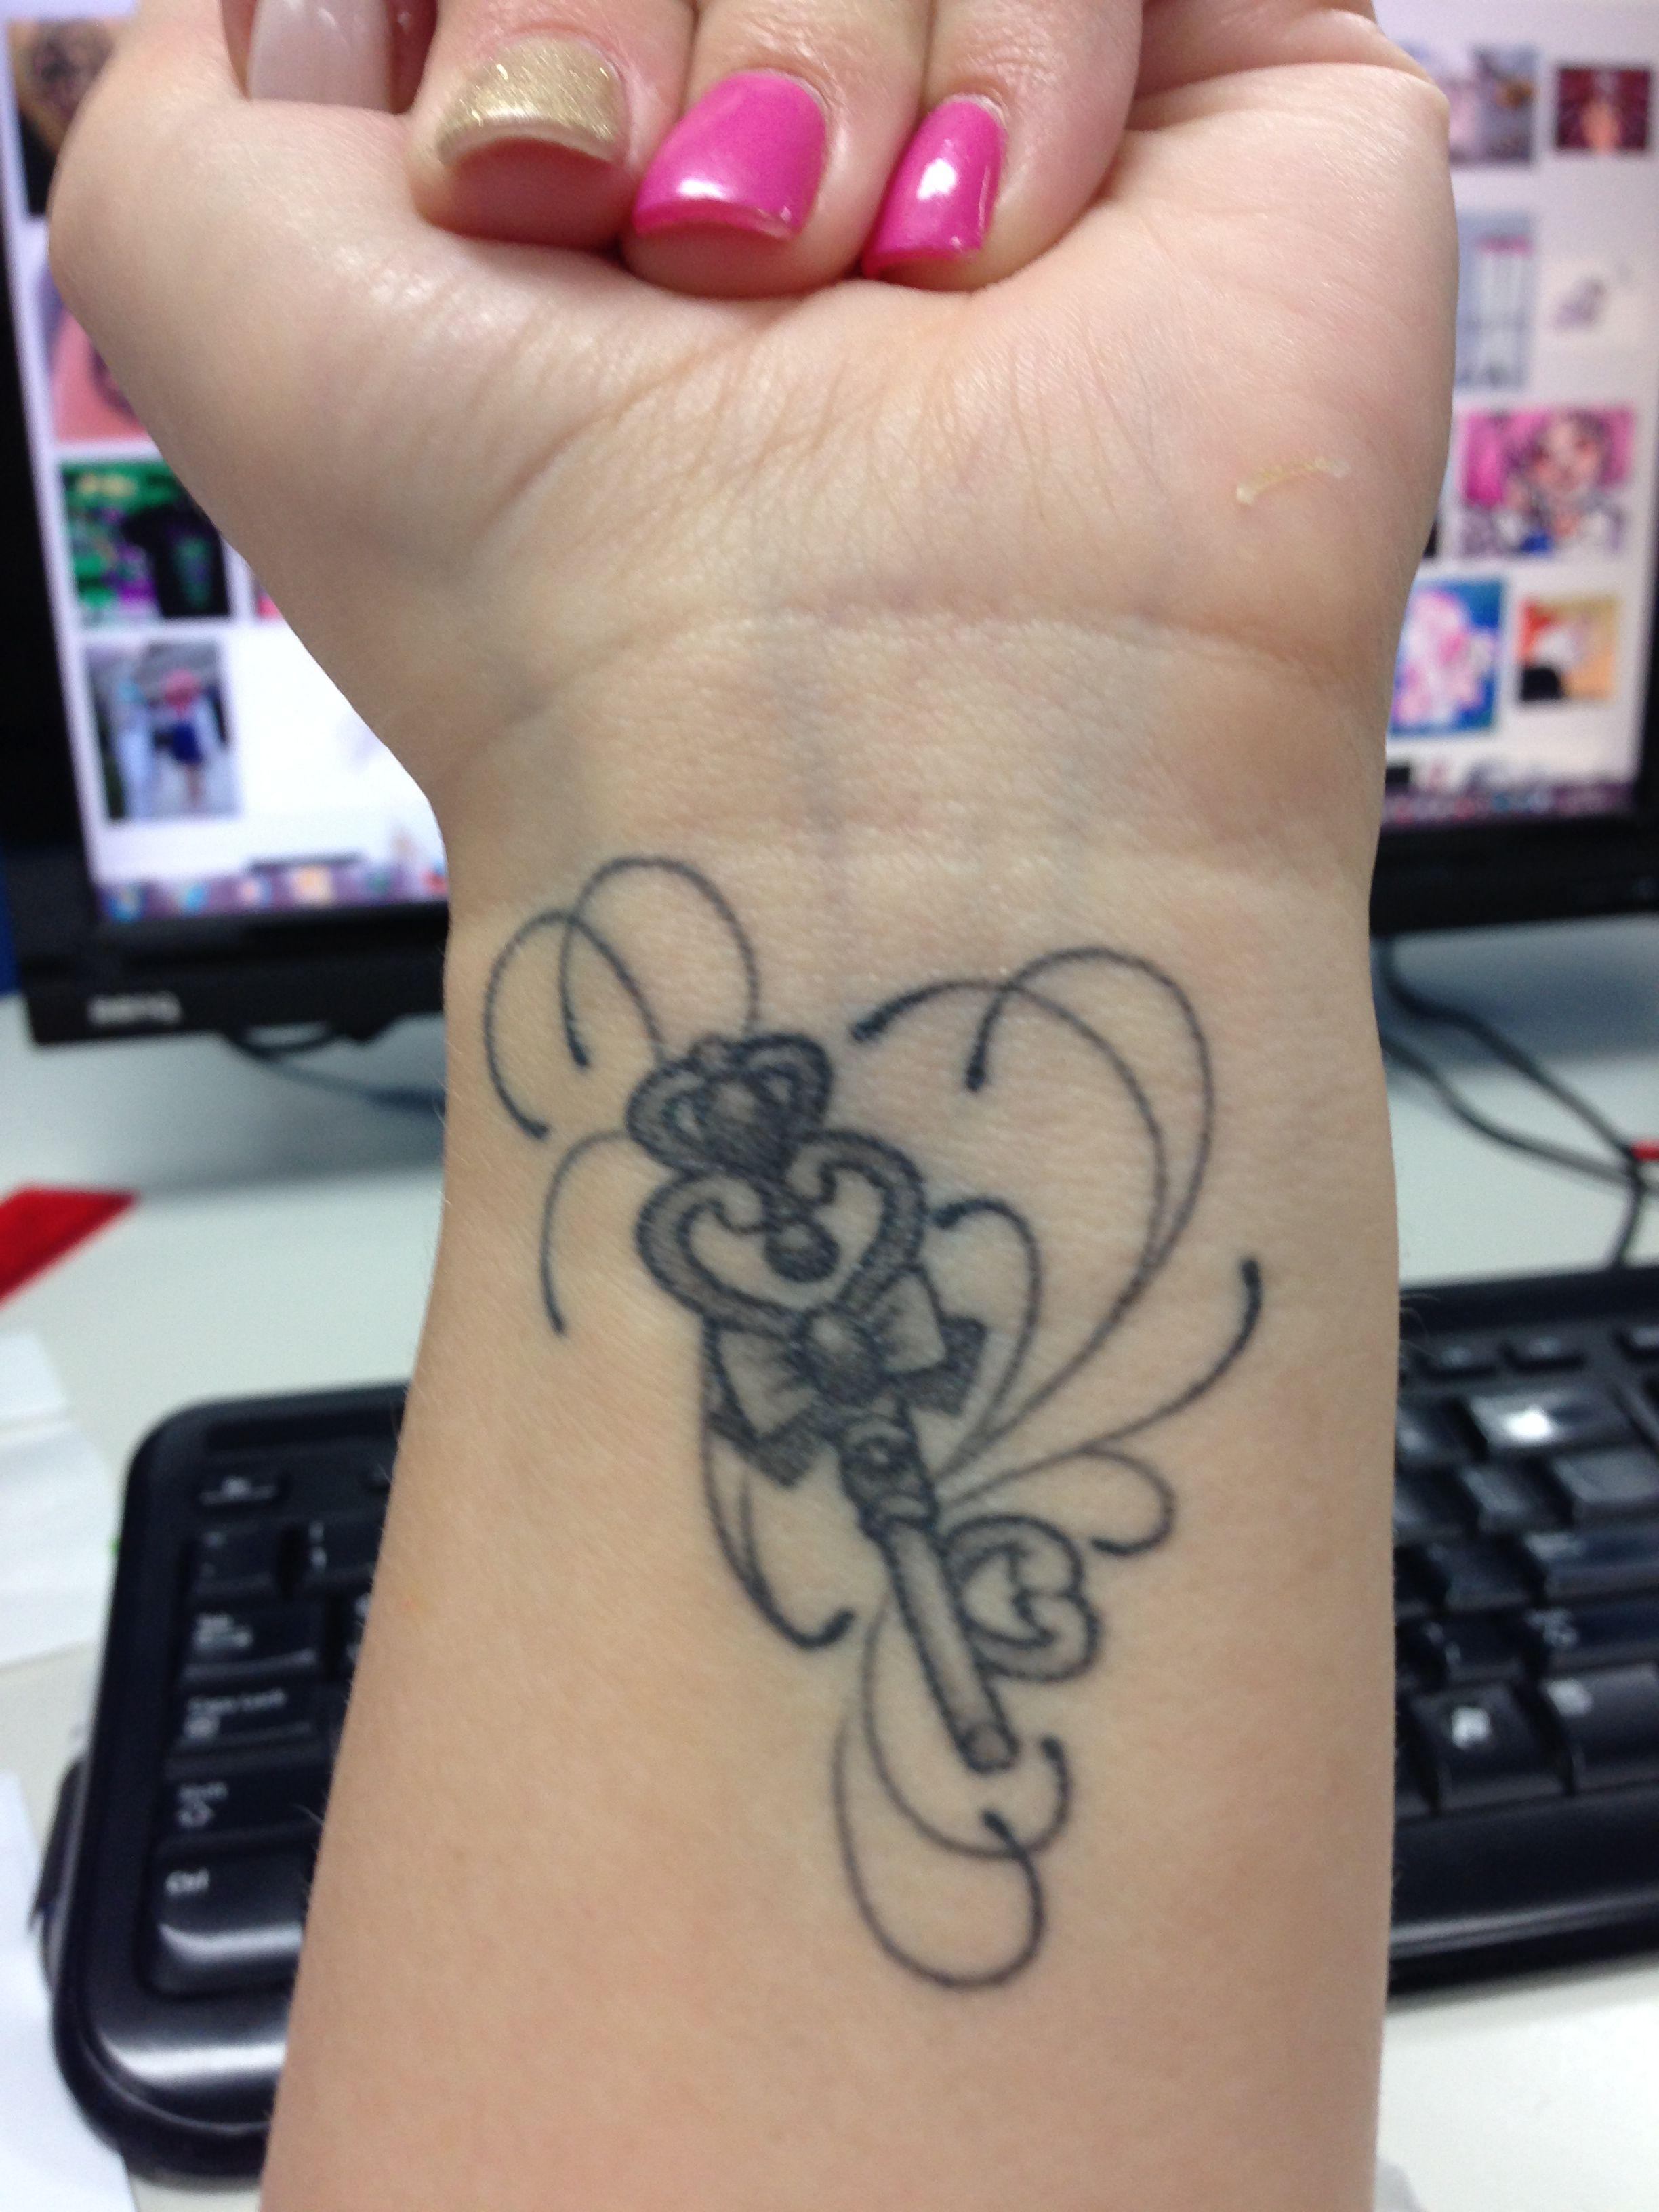 Sailor Moon, Chibiusa's Time Key tattoo